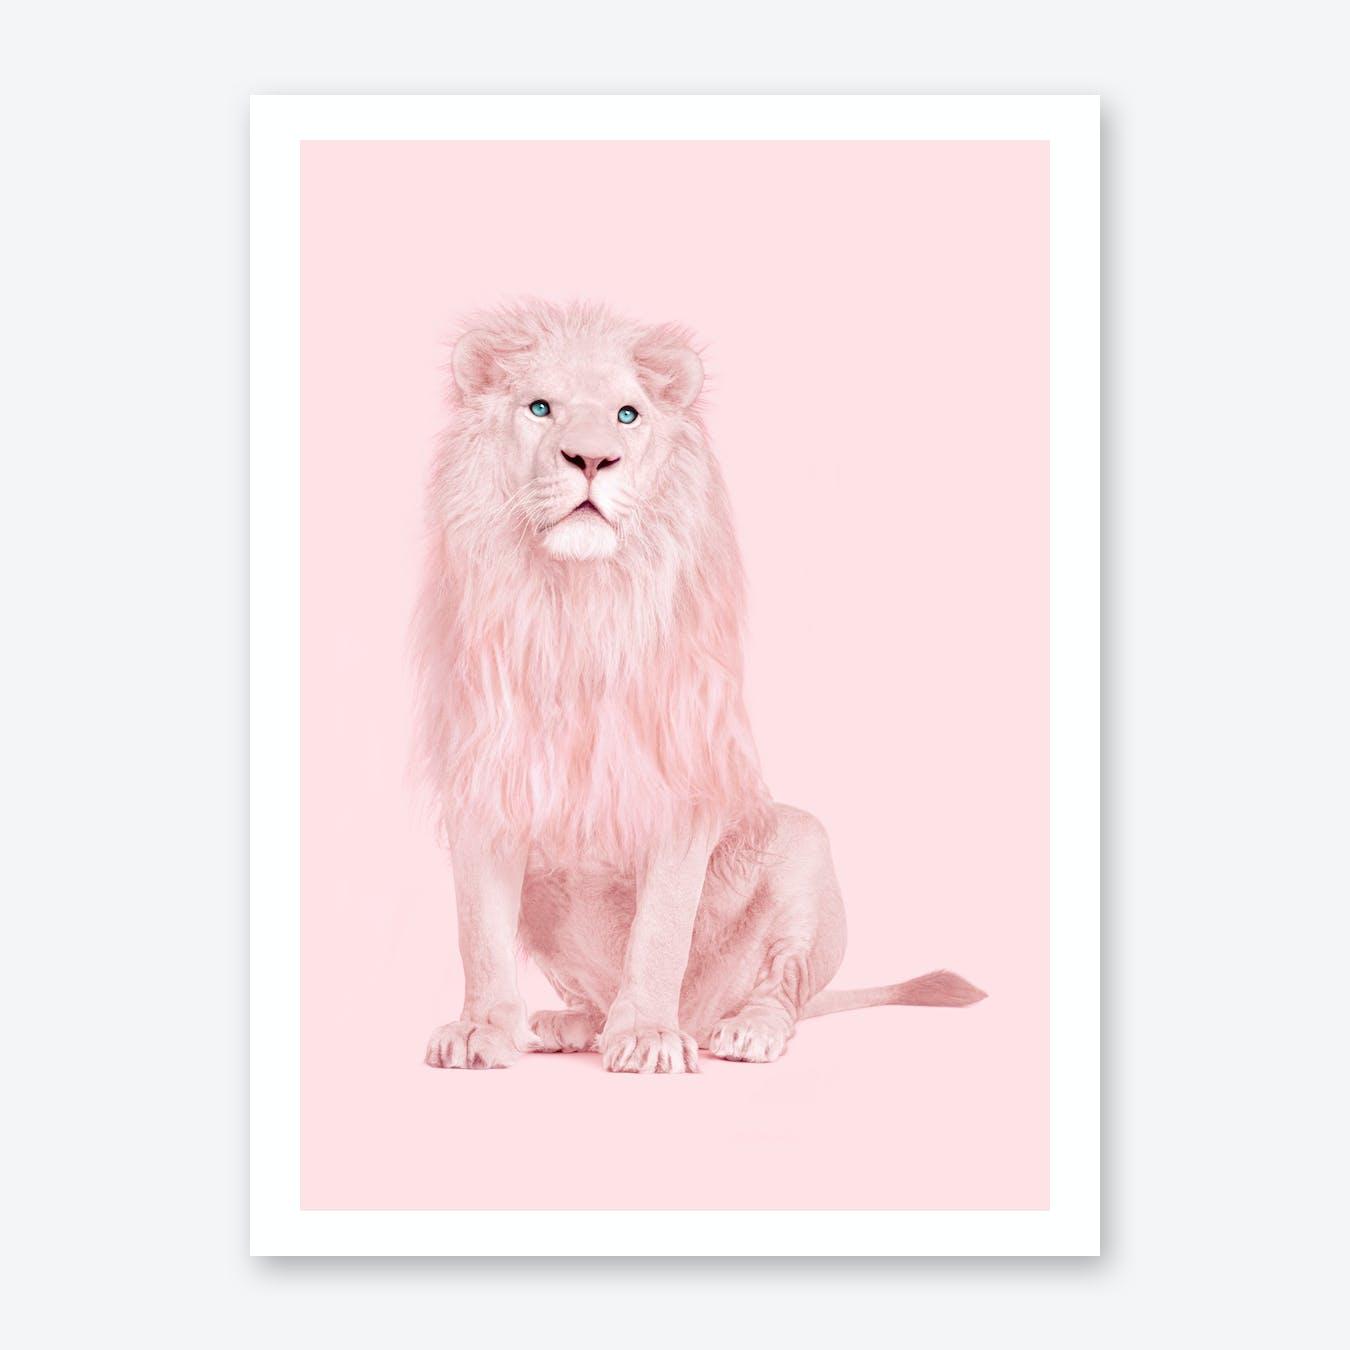 Albino Lion Print